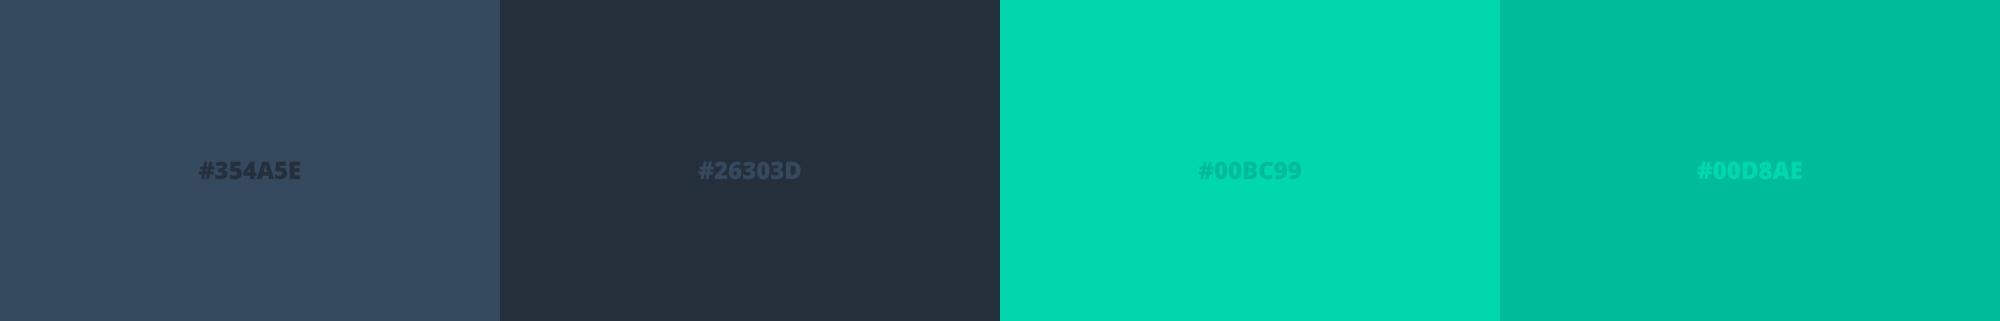 branding-colors